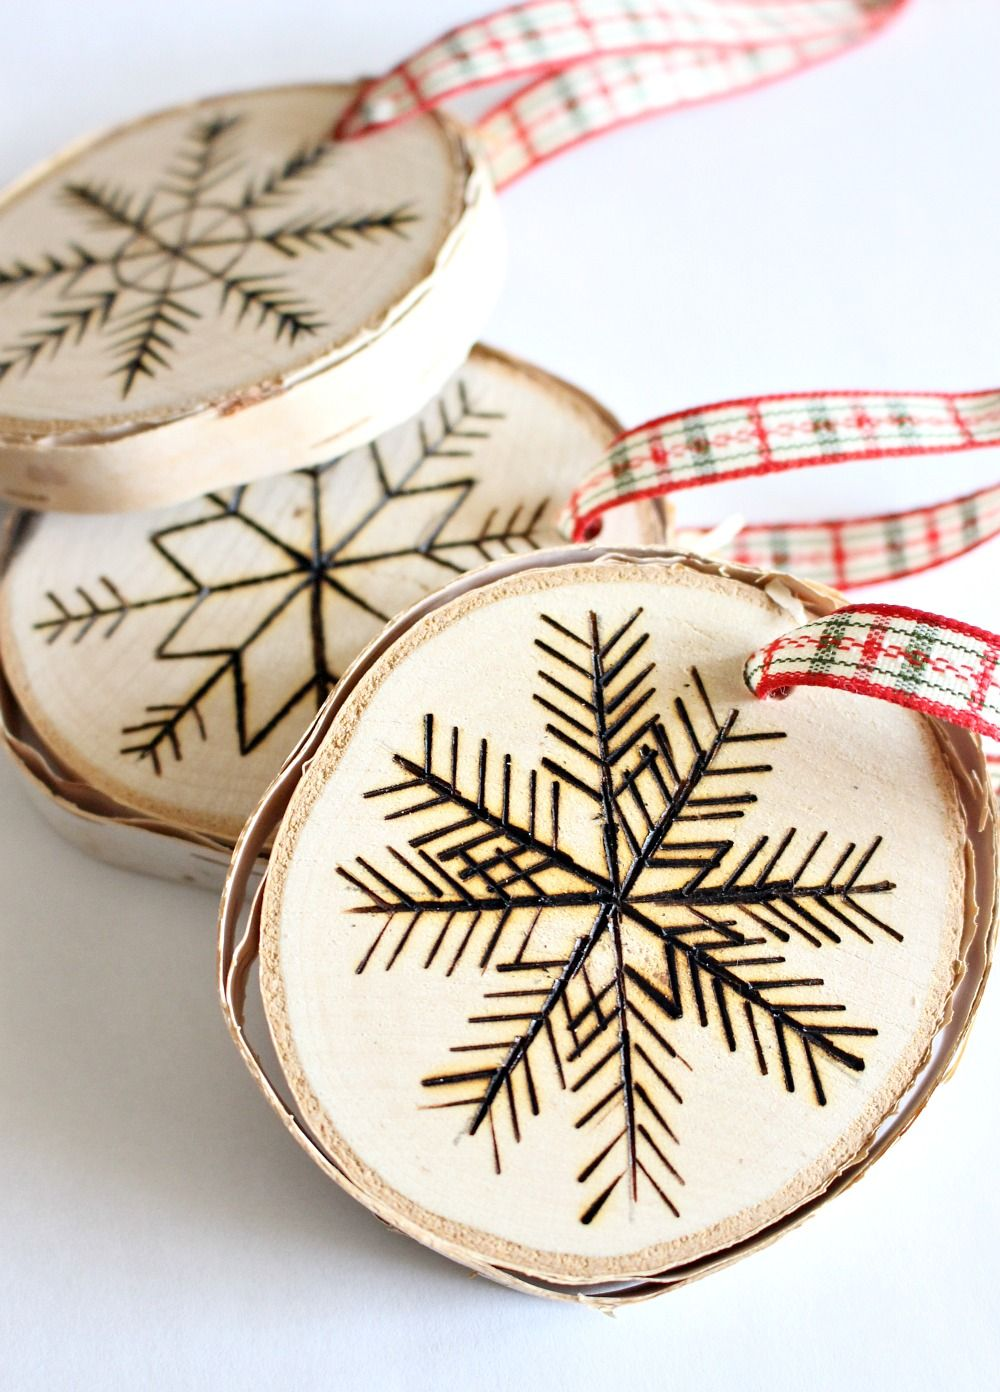 Birch wood slice ornament